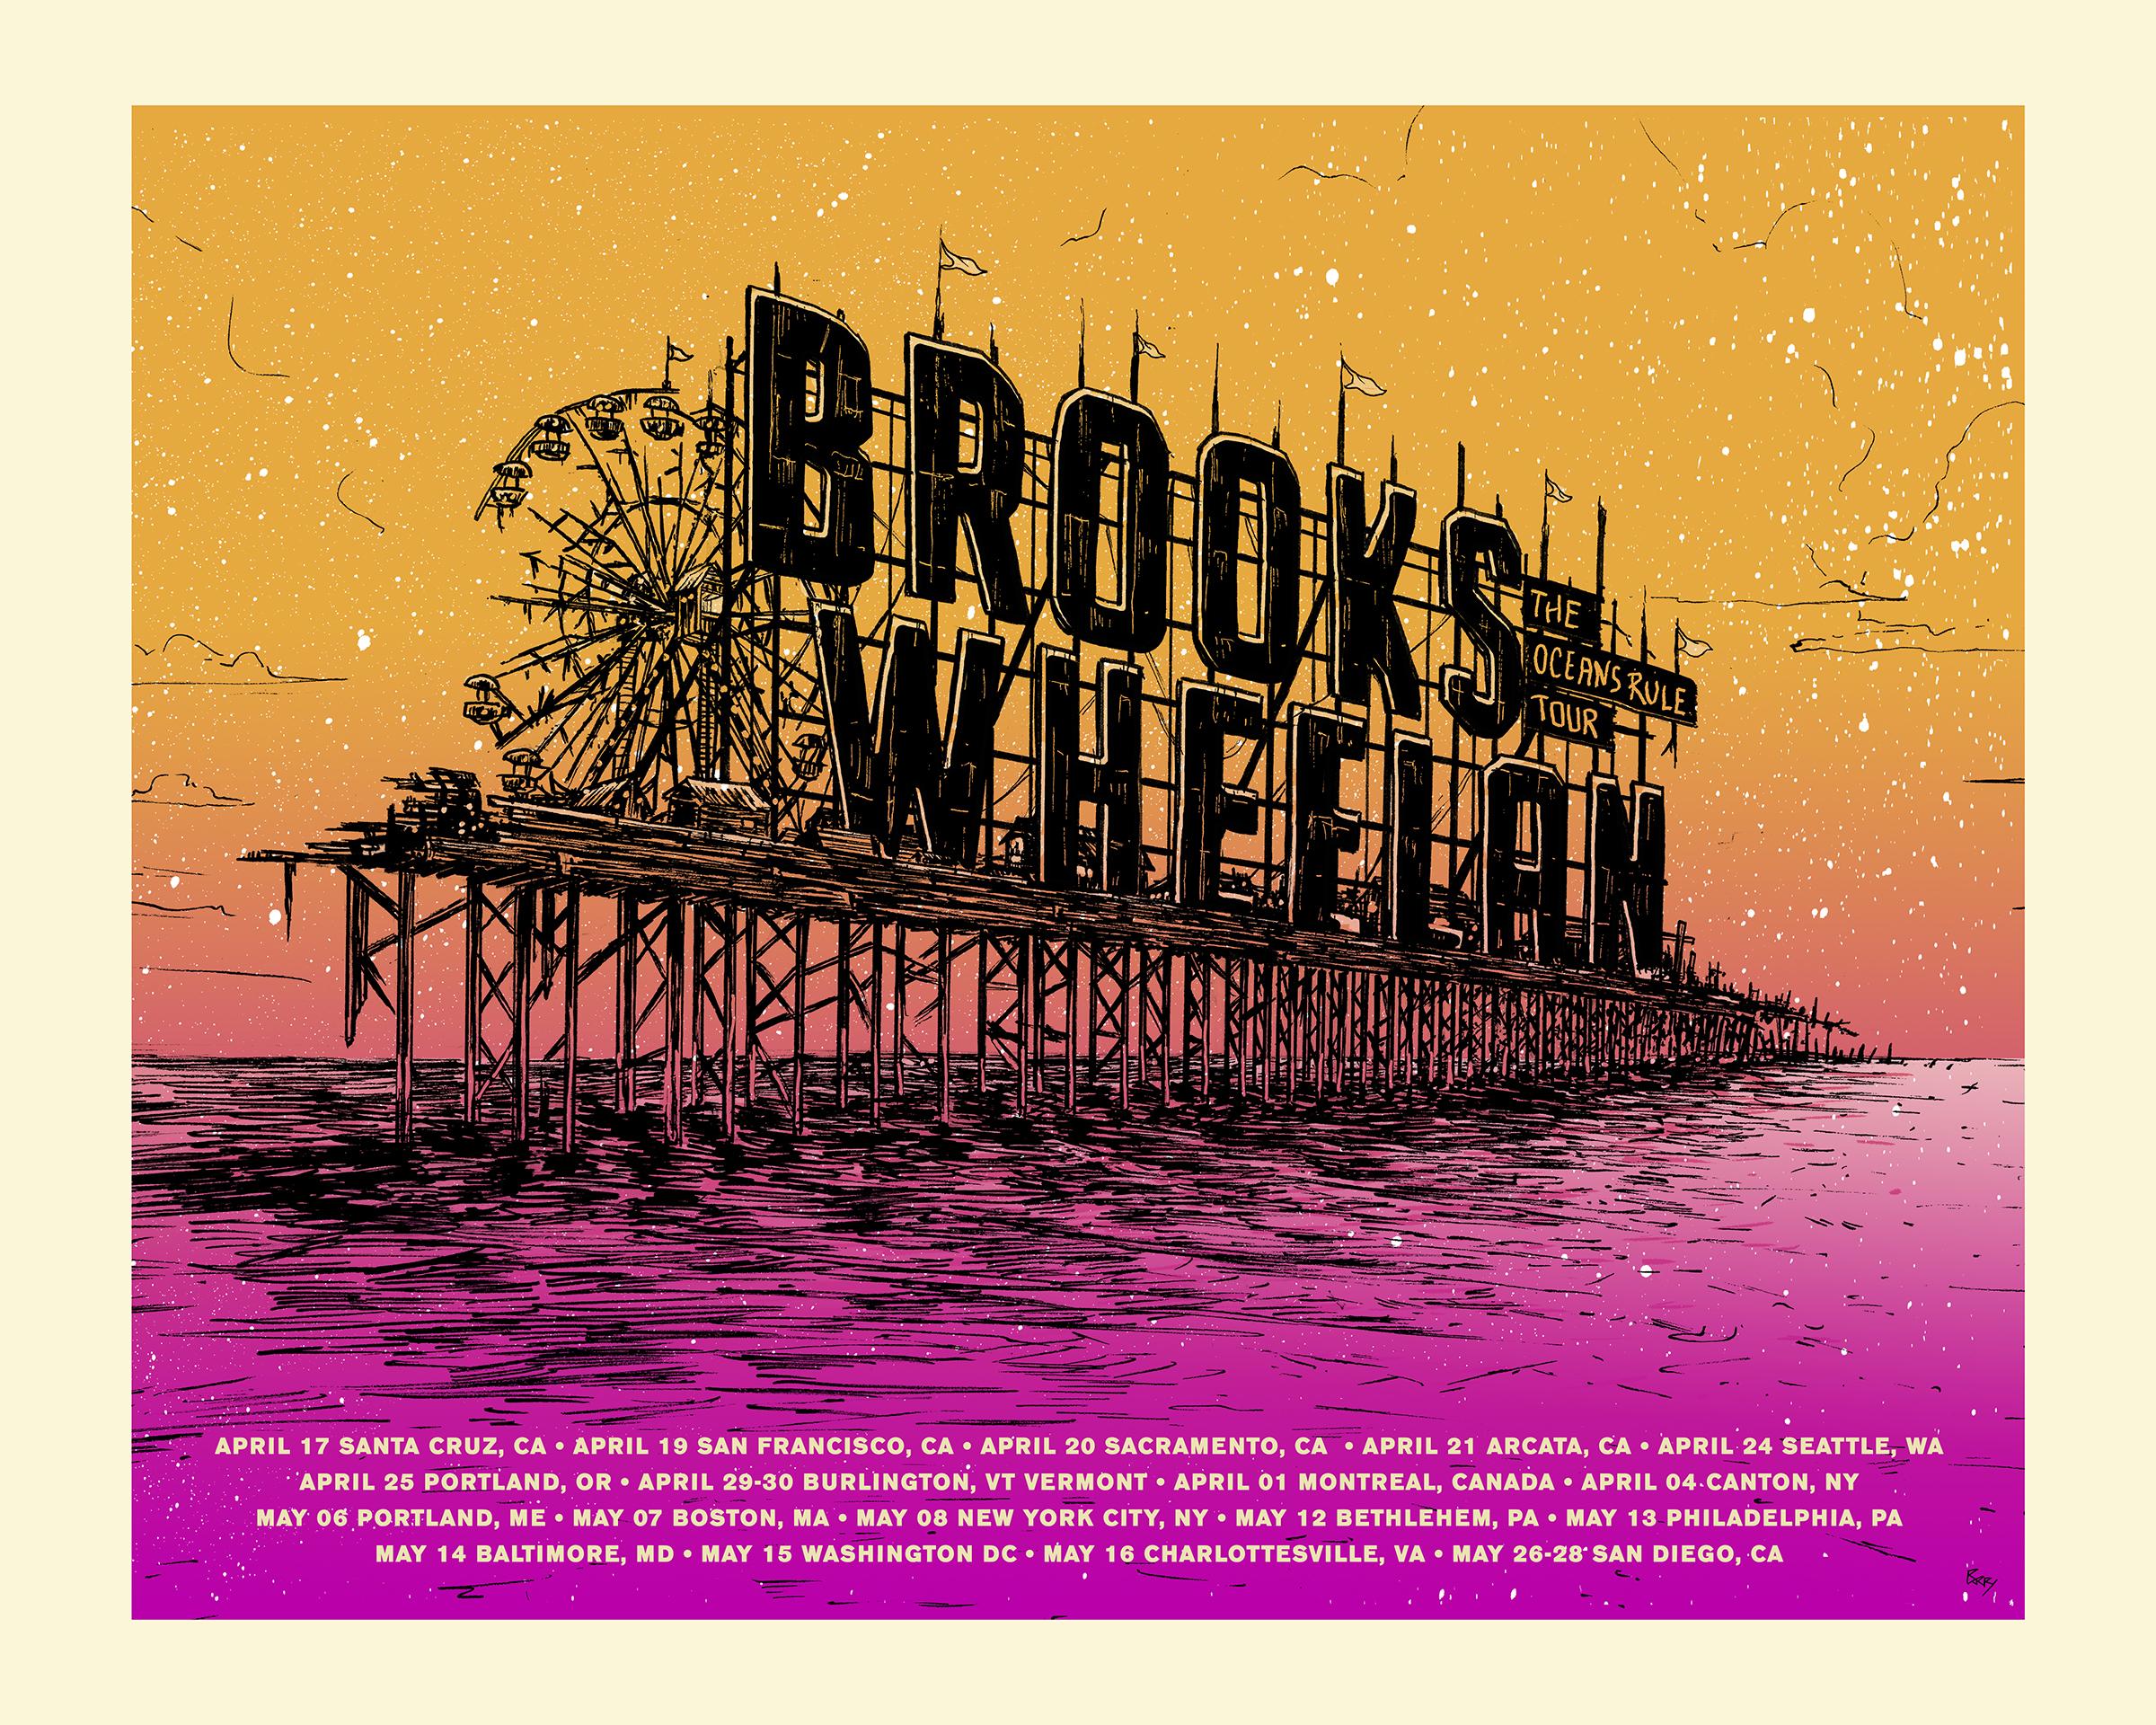 brooks_peir_tour.jpg